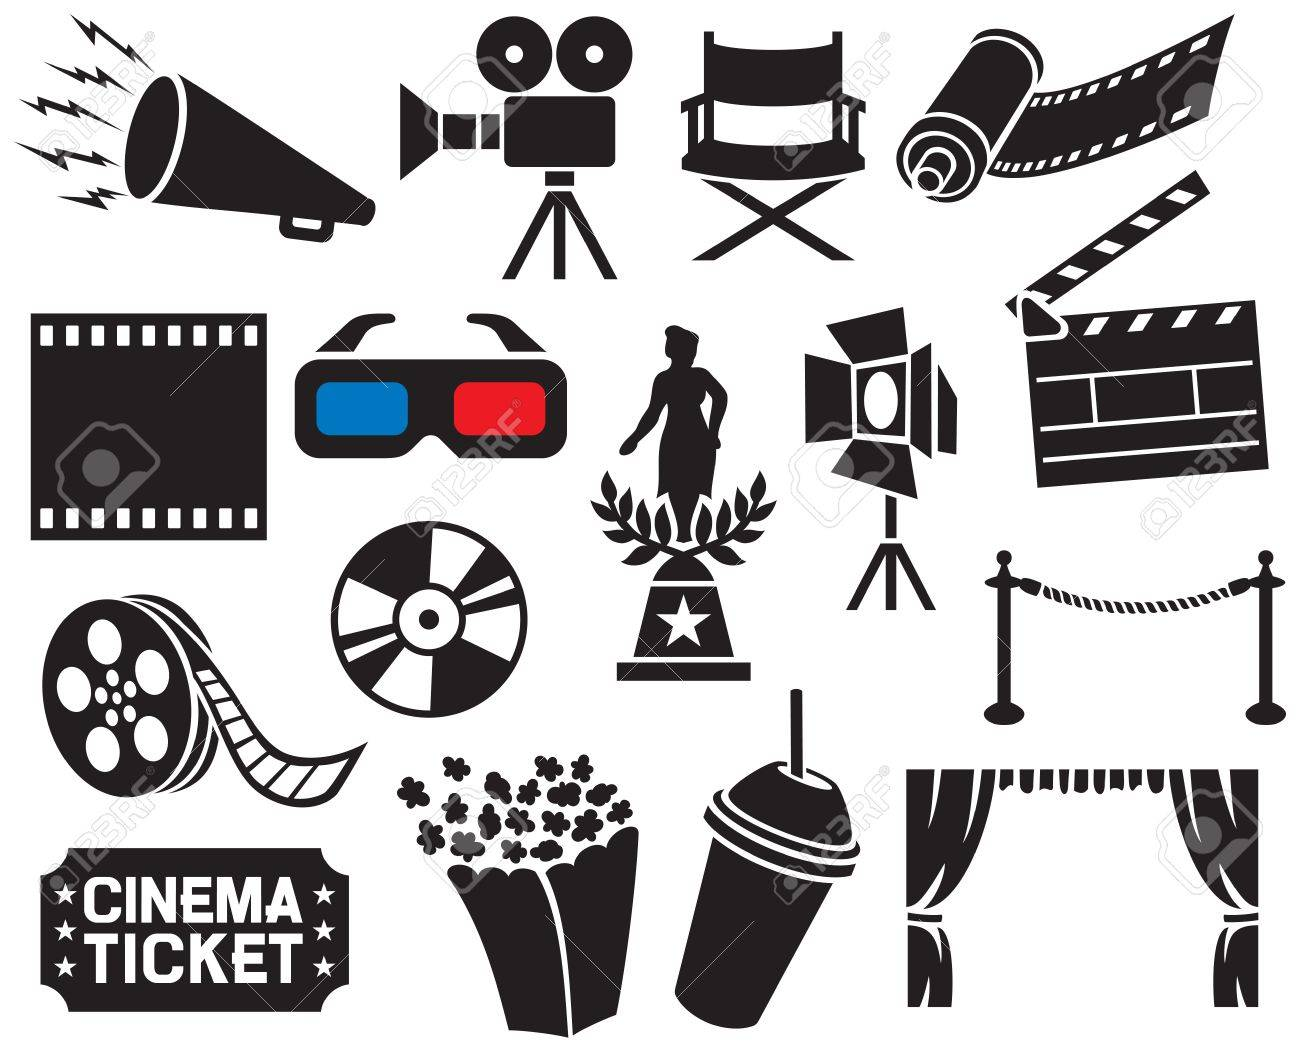 cinema icons collection (film strip, popcorn, cinema clapboard,..